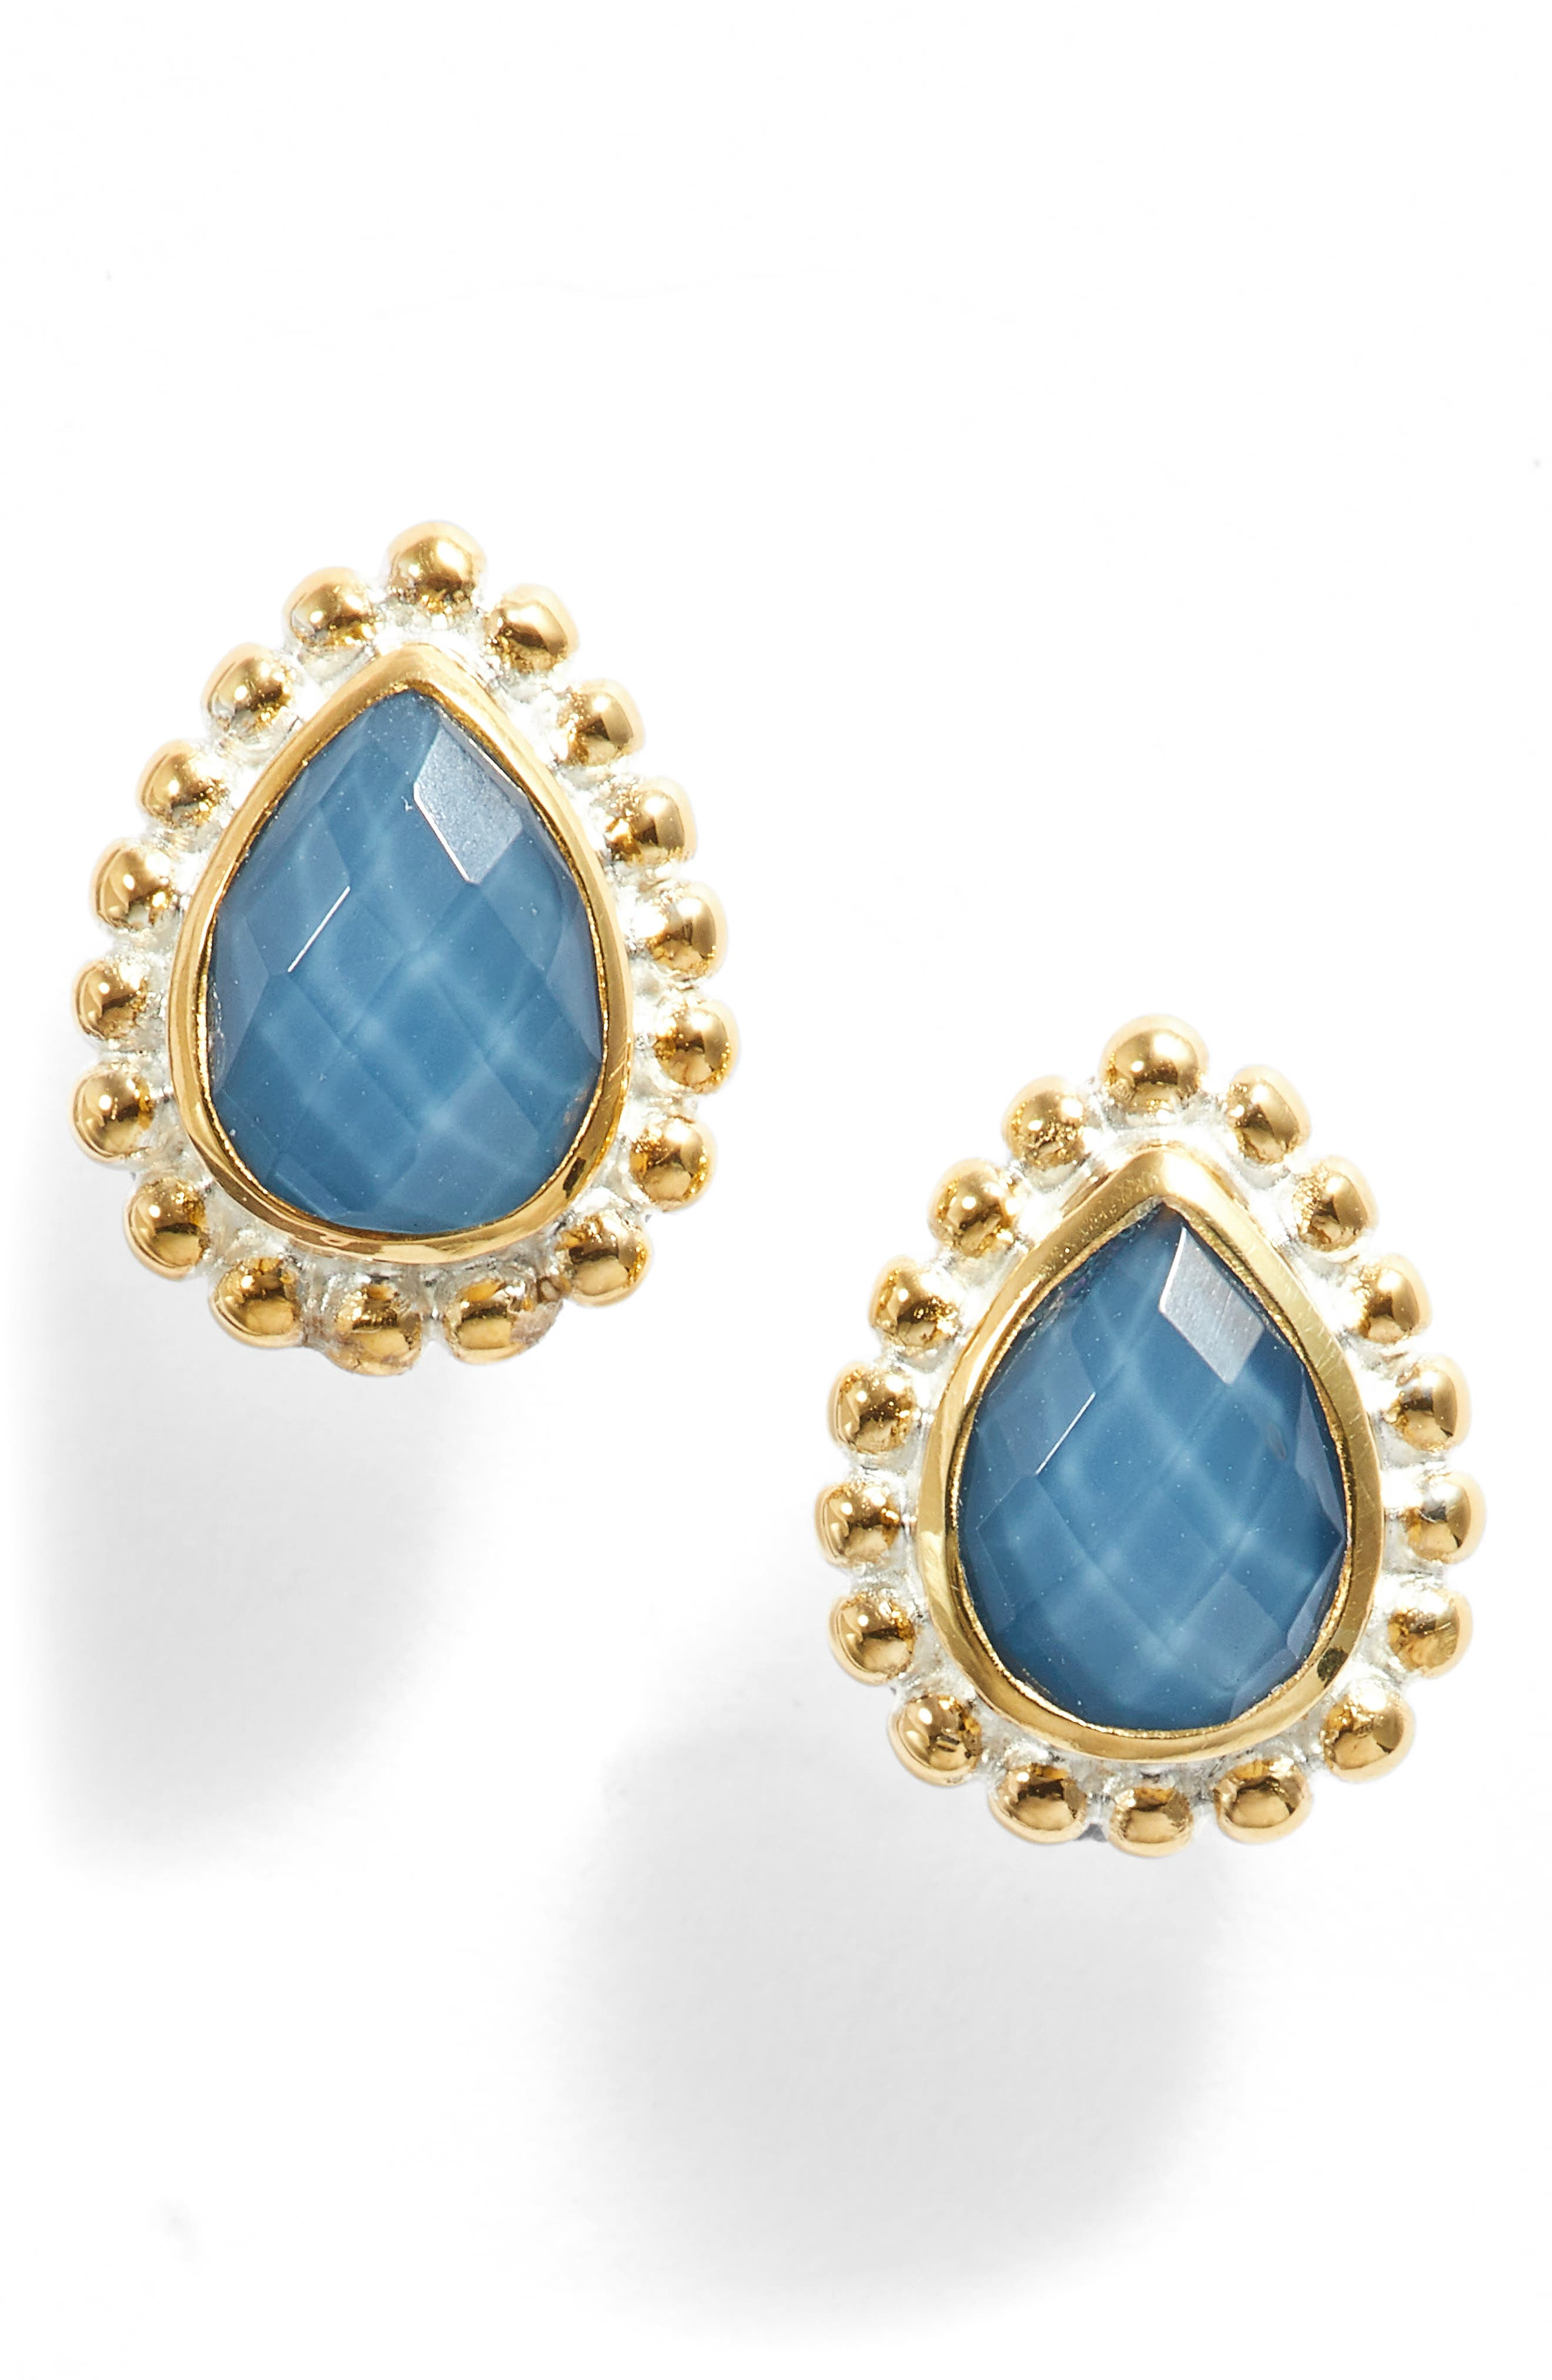 Main Image - Anna Beck Blue Quartz Teardrop Stud Earrings